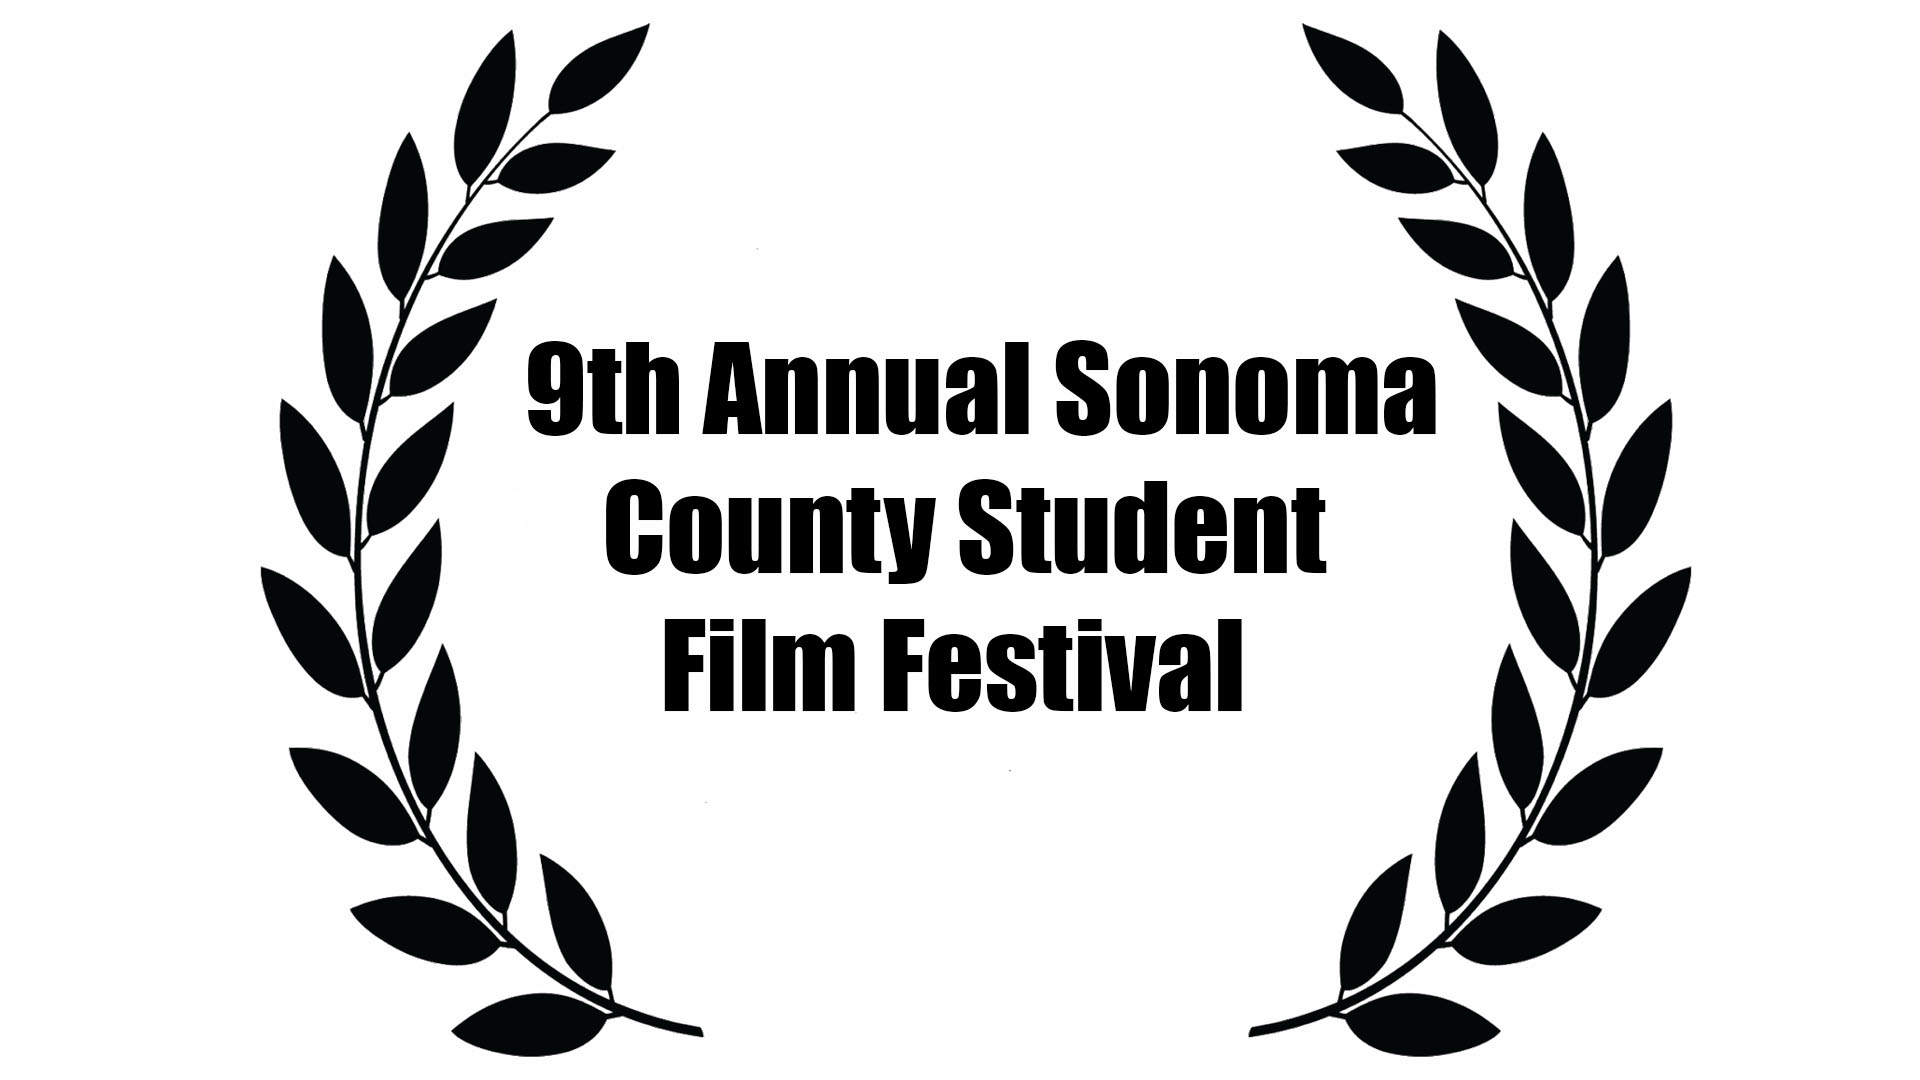 9th annual sonoma county student film fest.jpg